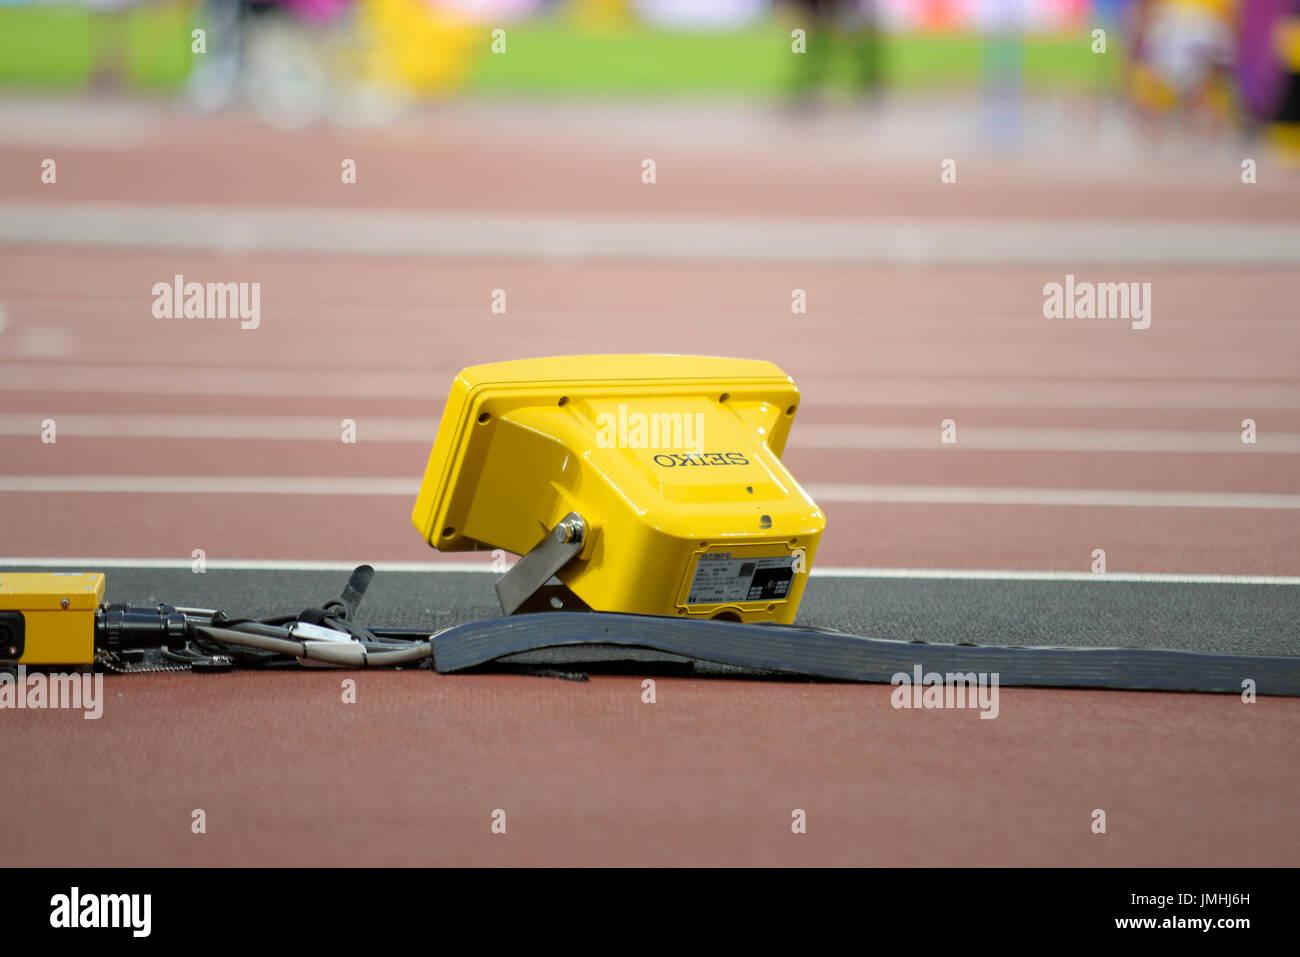 Seiko track starting equipment at the World Para Athletics Championships in the London Stadium - Stock Image